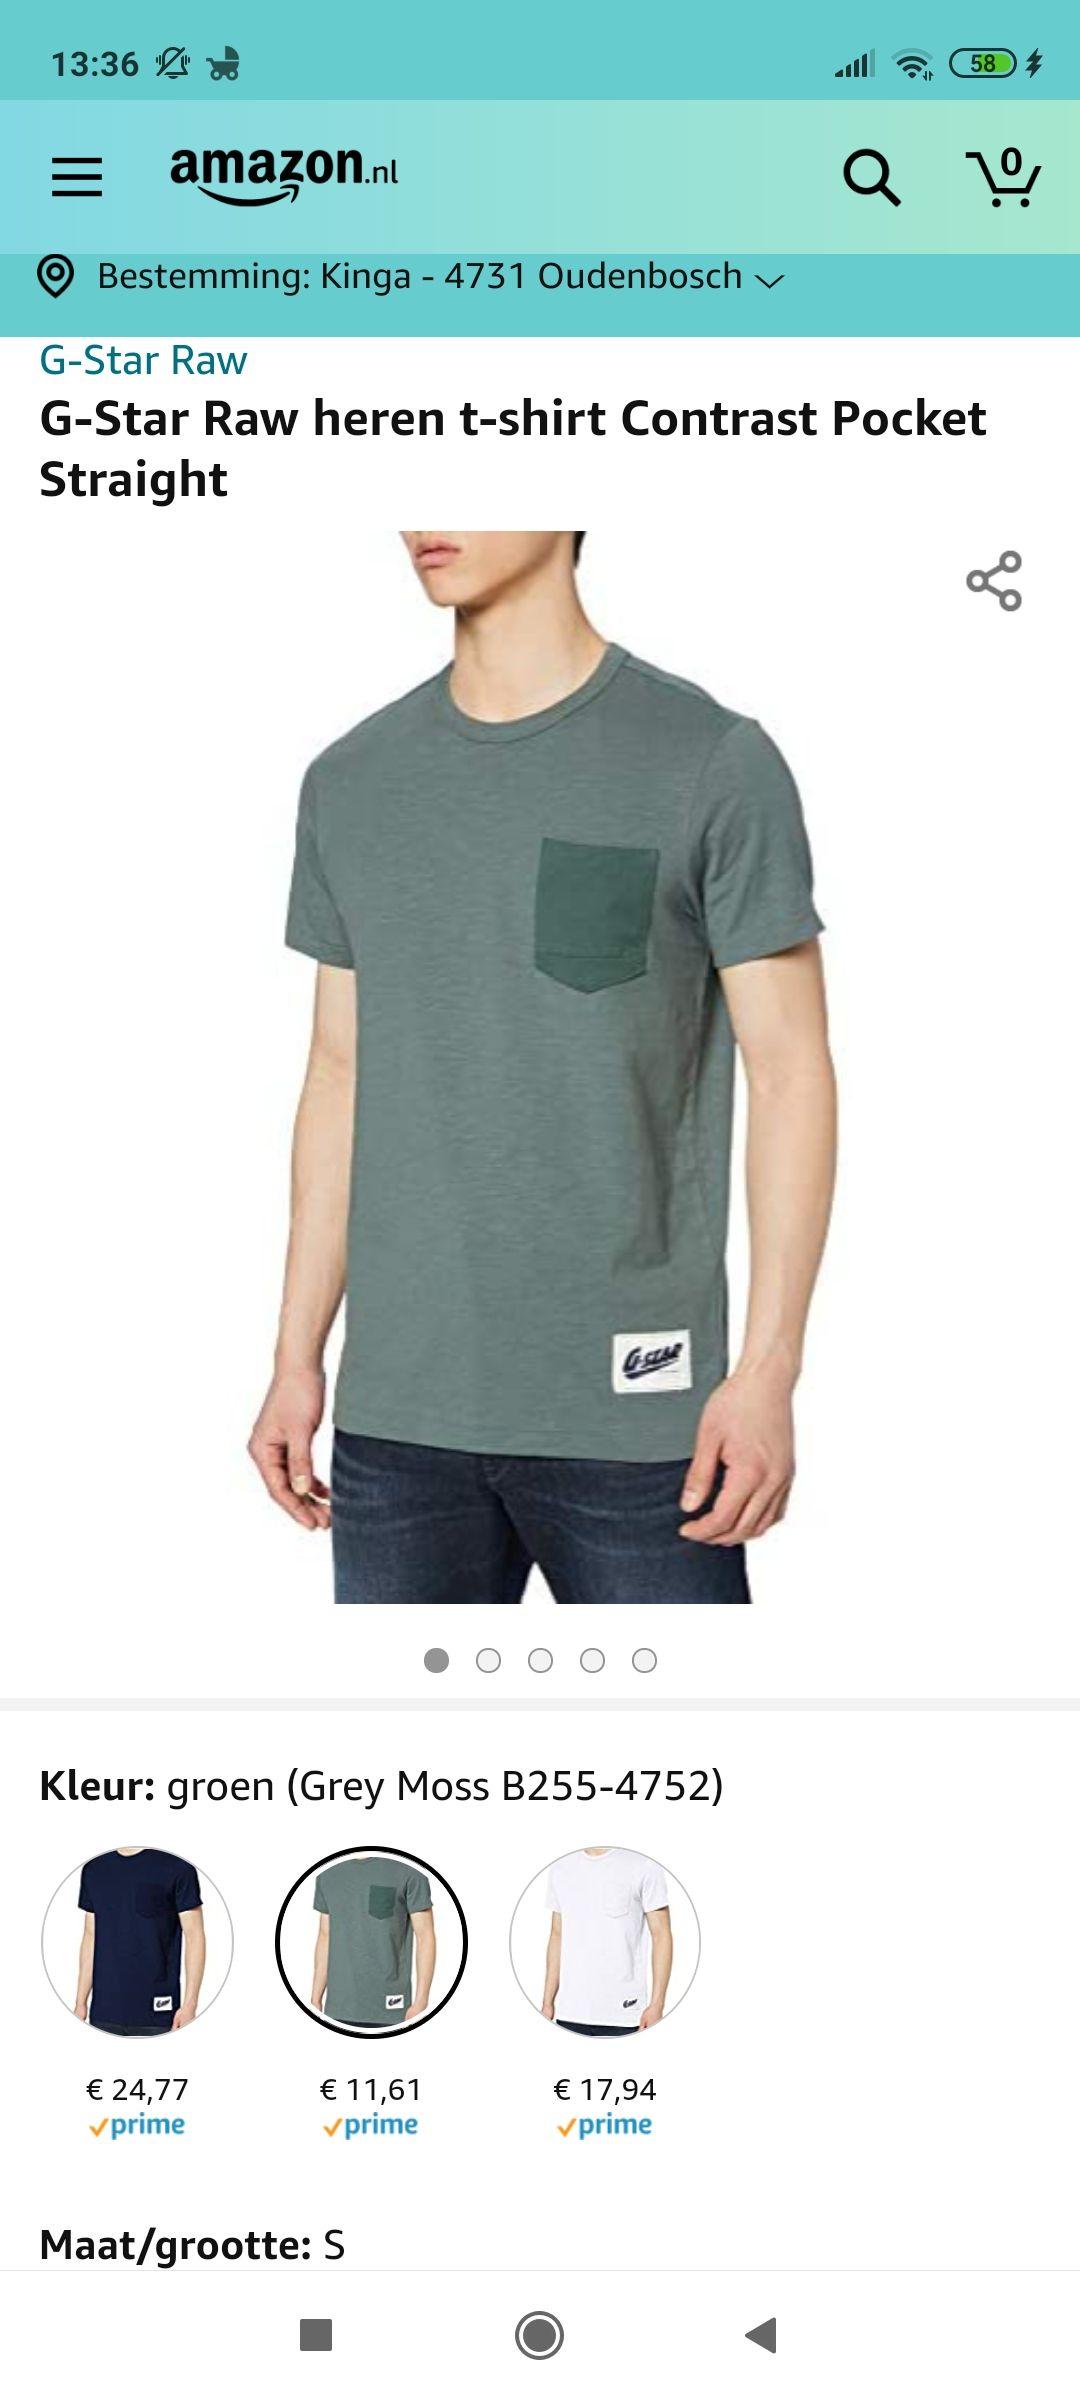 Amazon.nl G-Star Raw heren t-shirt Contrast Pocket Straight